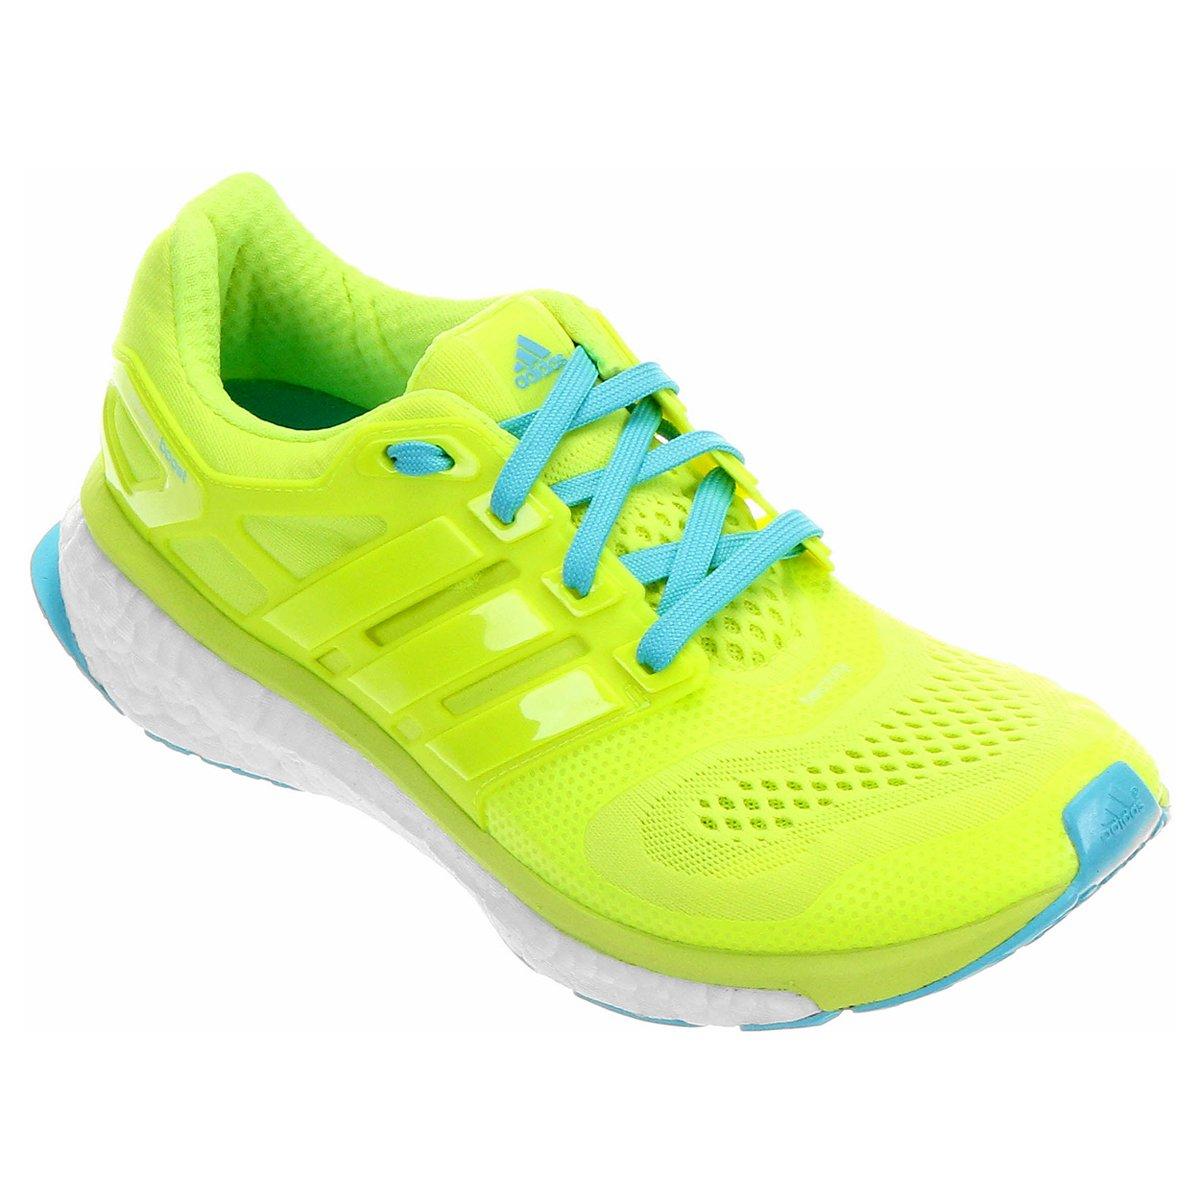 8f062adf25 Tênis Adidas Energy Boost ESM Masculino - Compre Agora